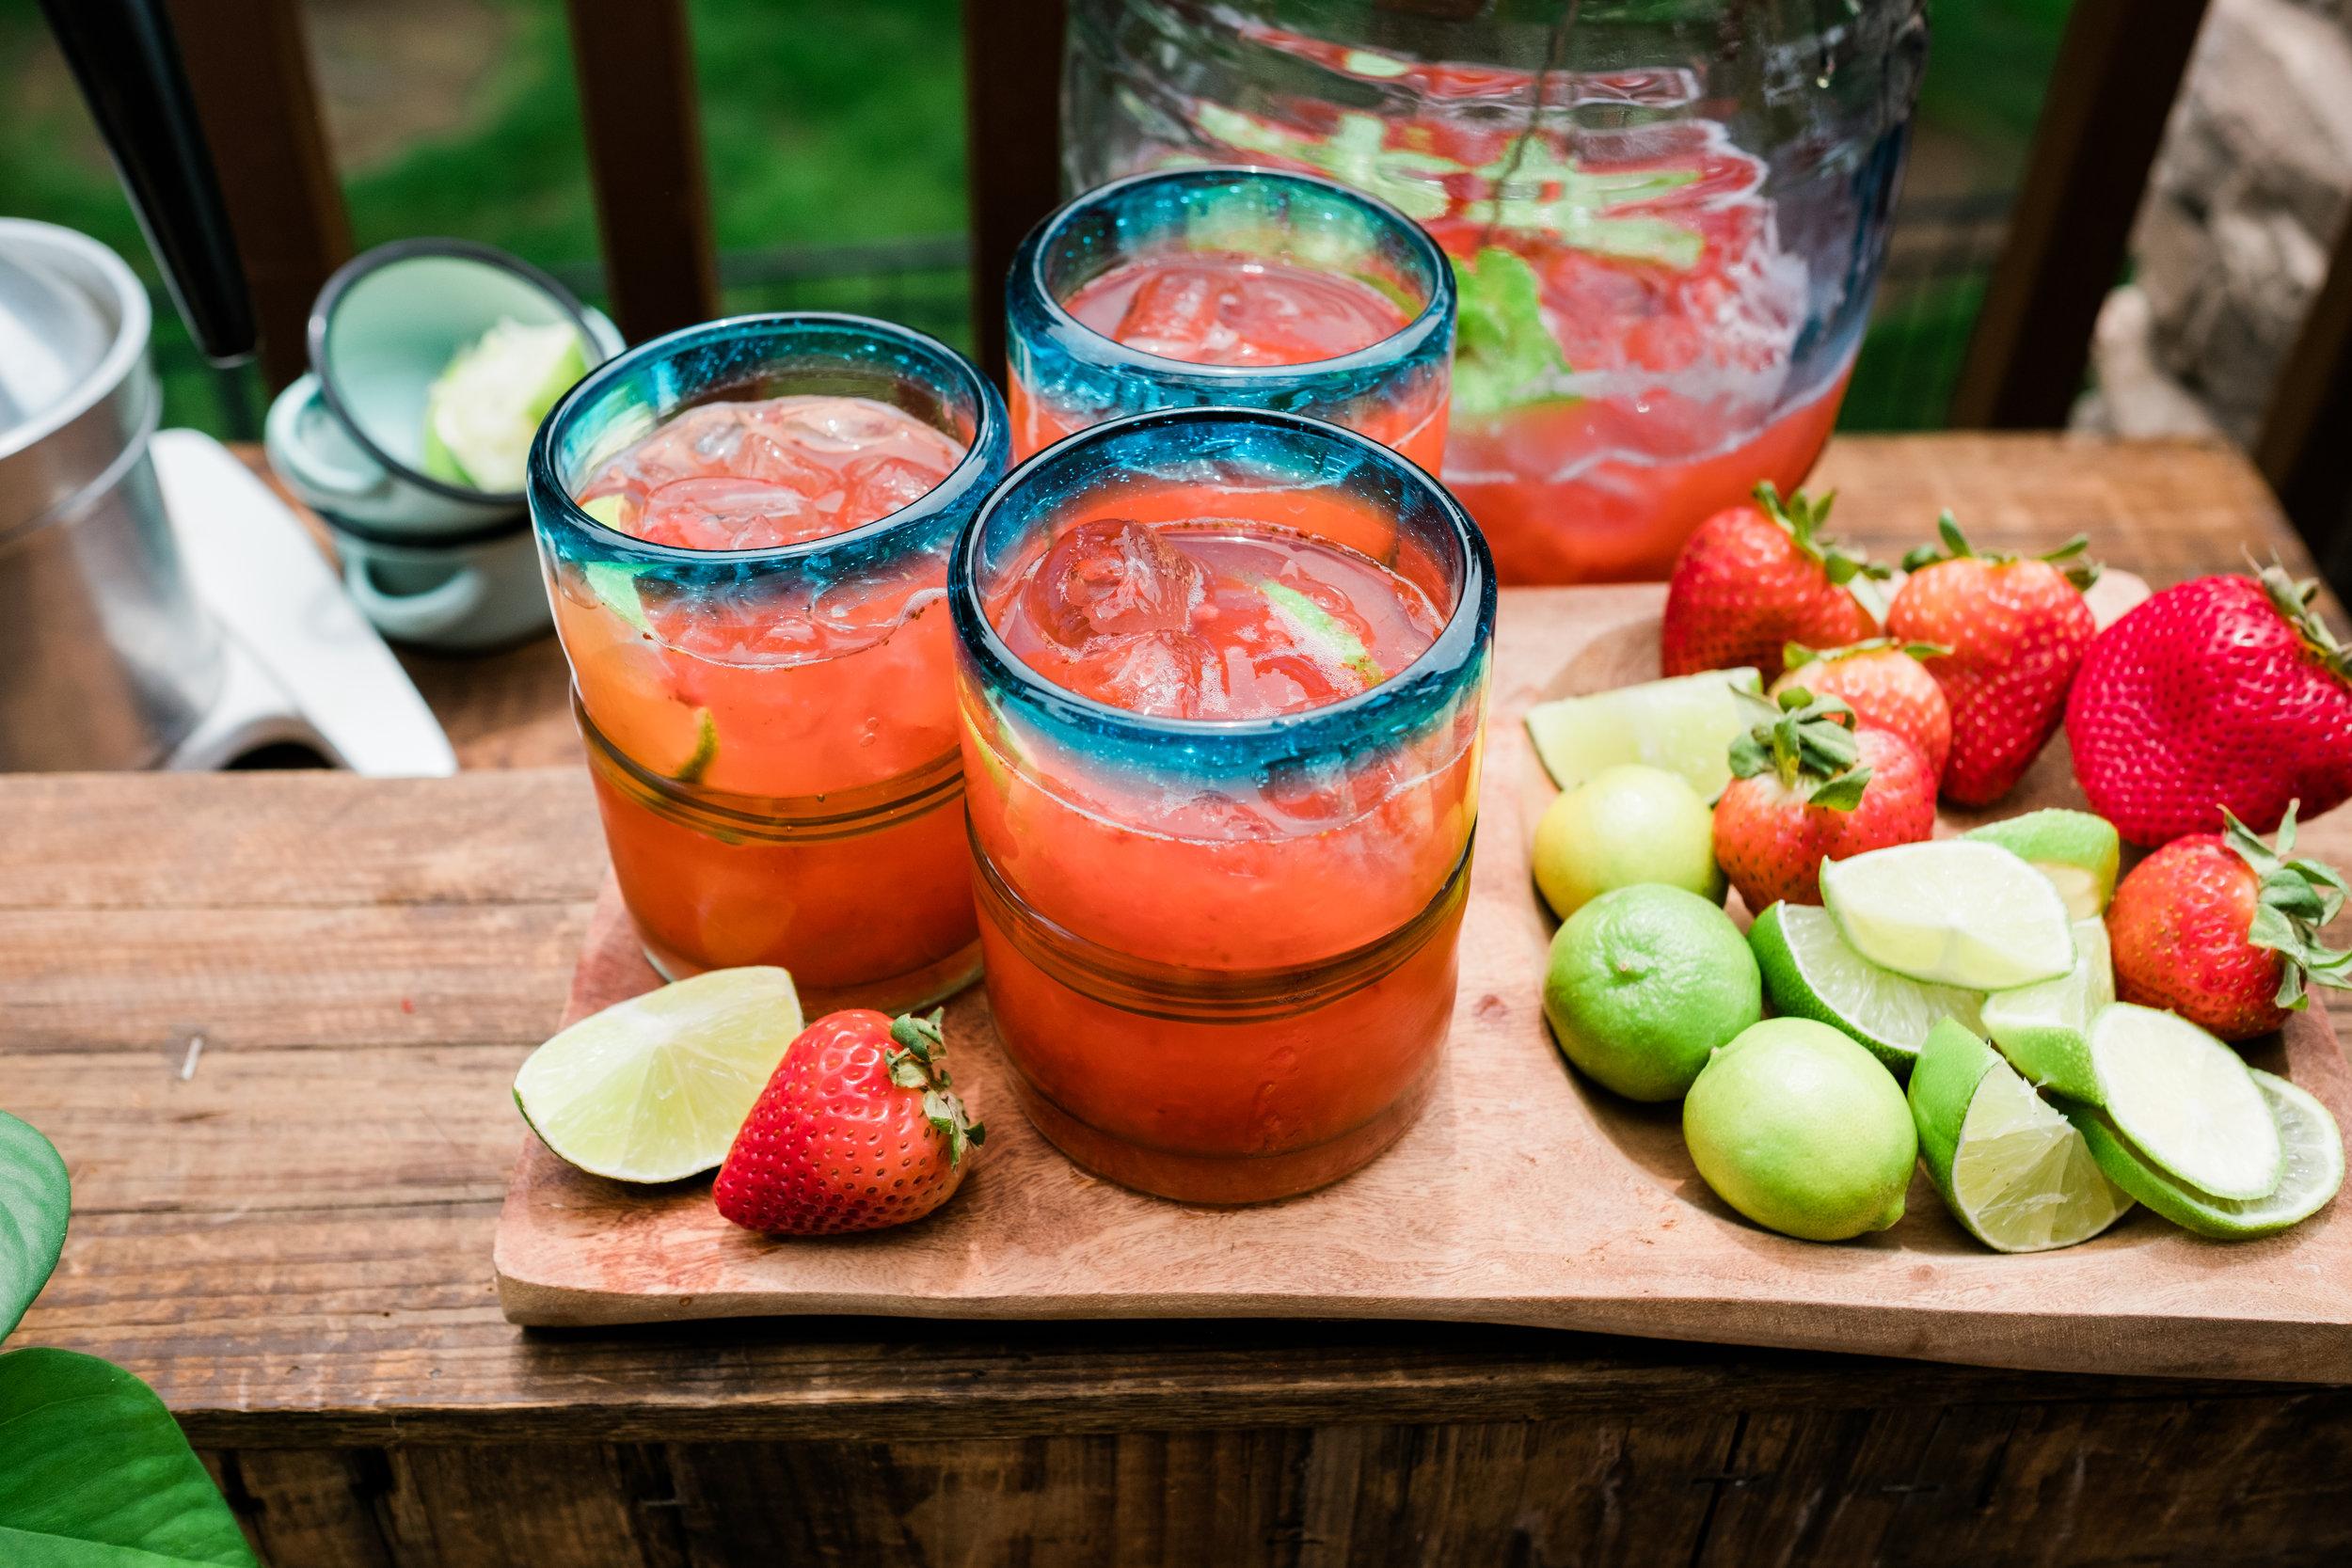 Strawberry limonada served